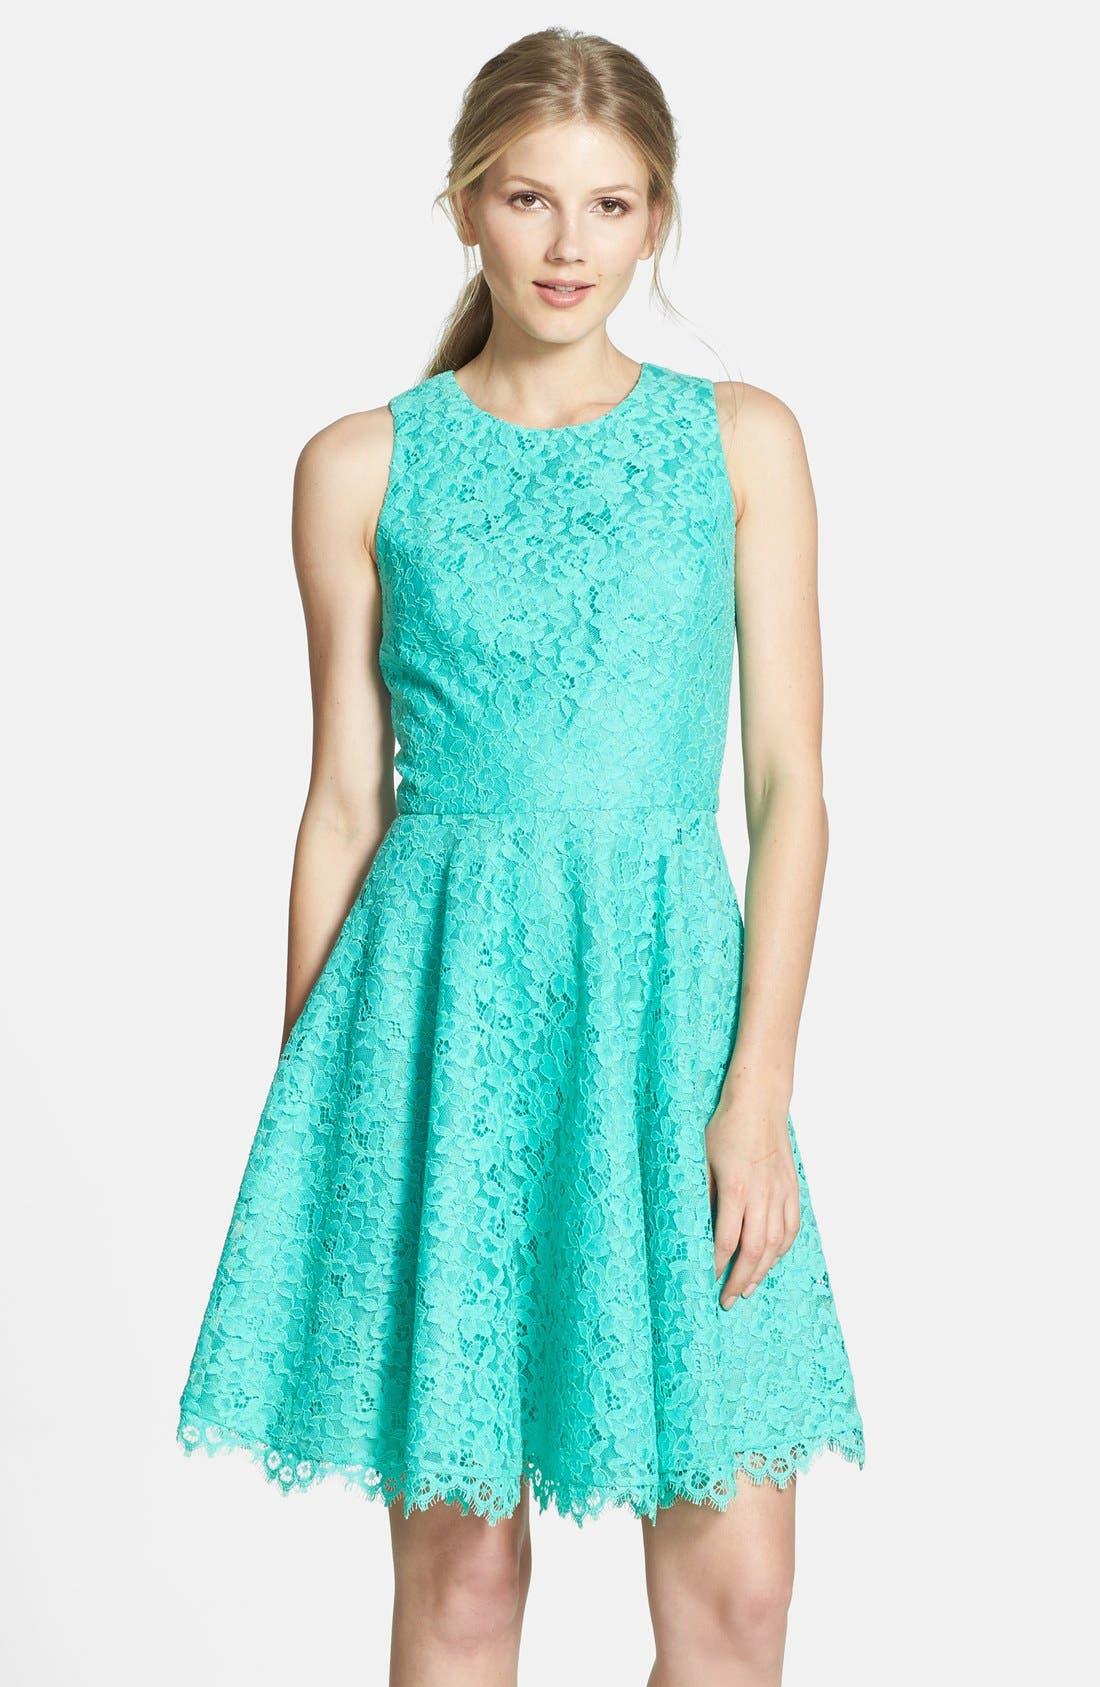 Main Image - Shoshanna 'Judith' Lace Fit & Flare Dress